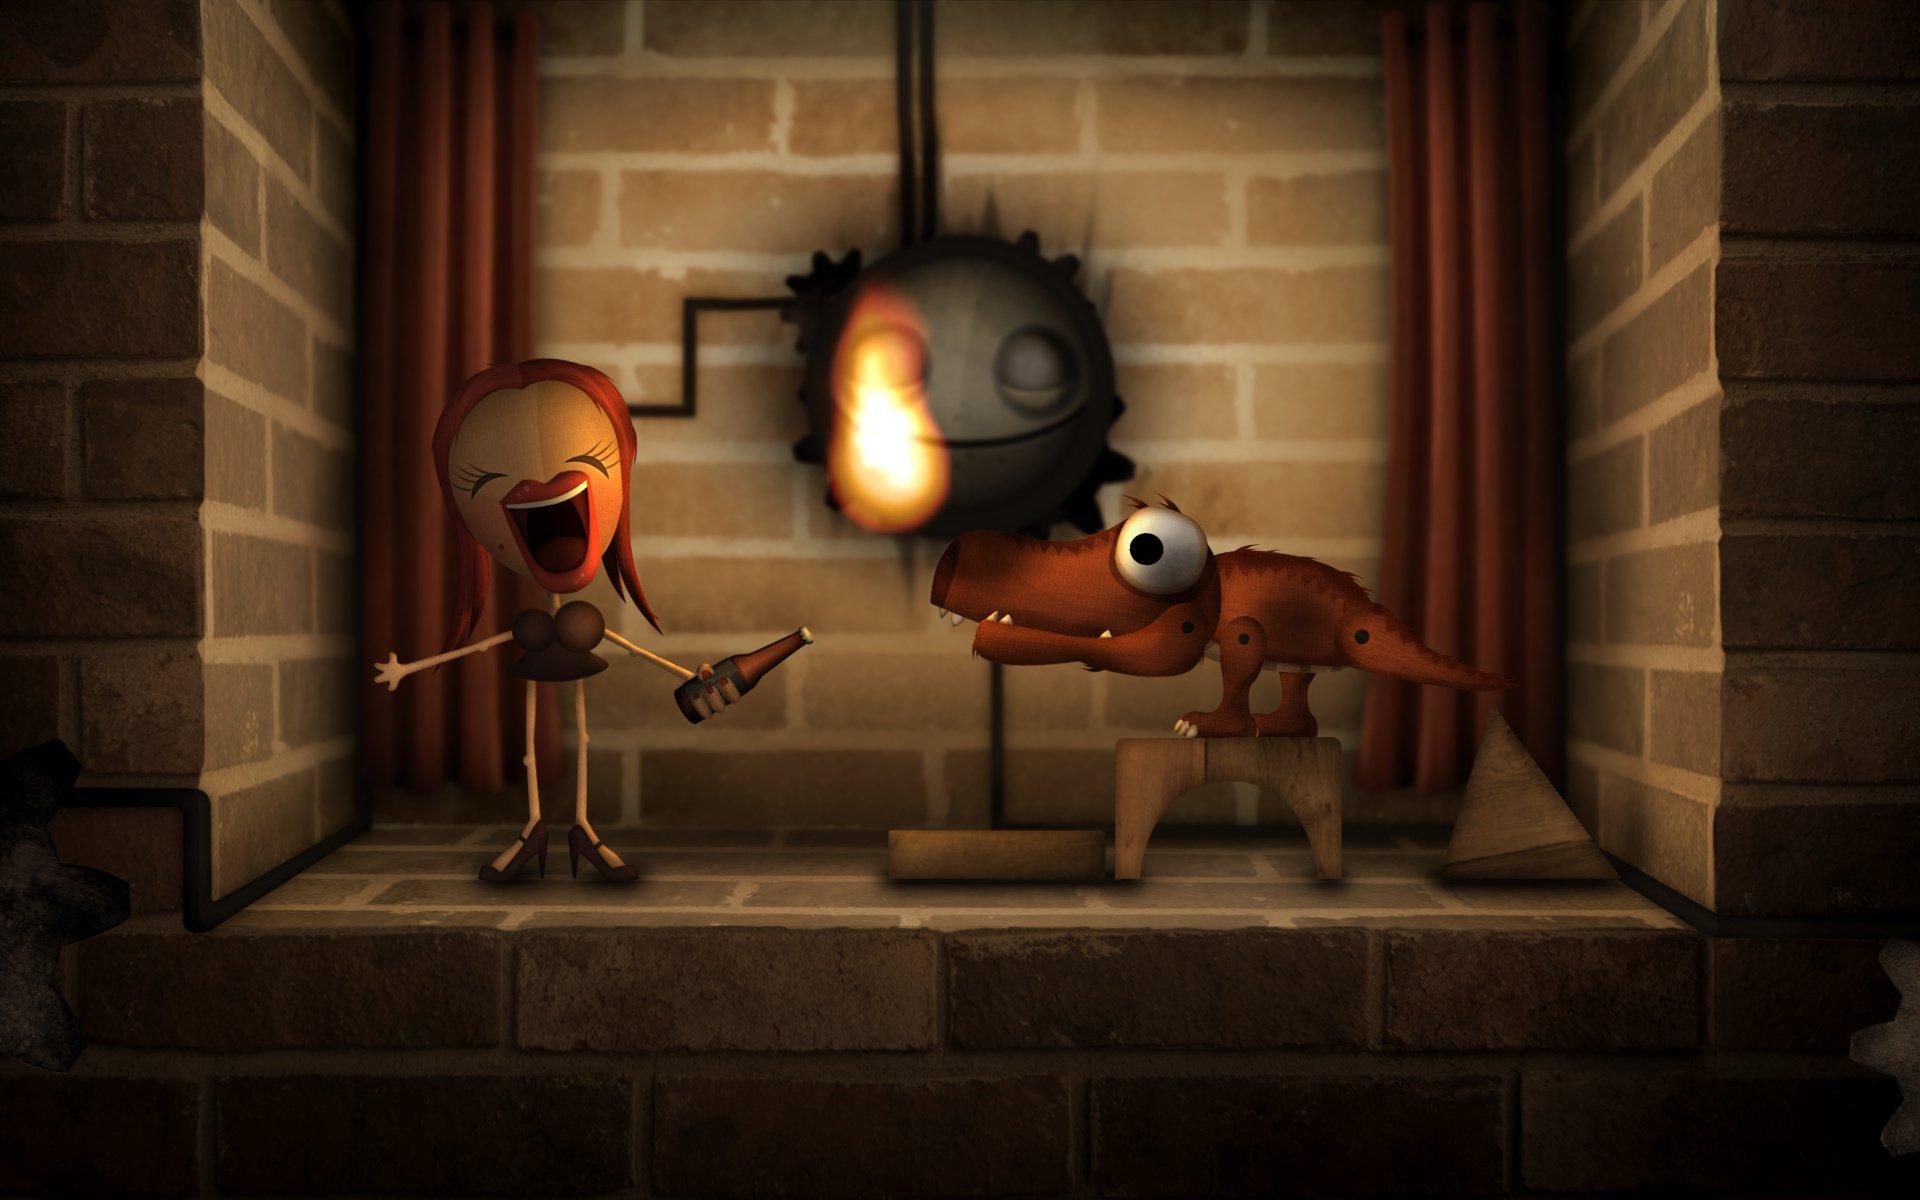 http://images.nintendolife.com/screenshots/44130/large.jpg